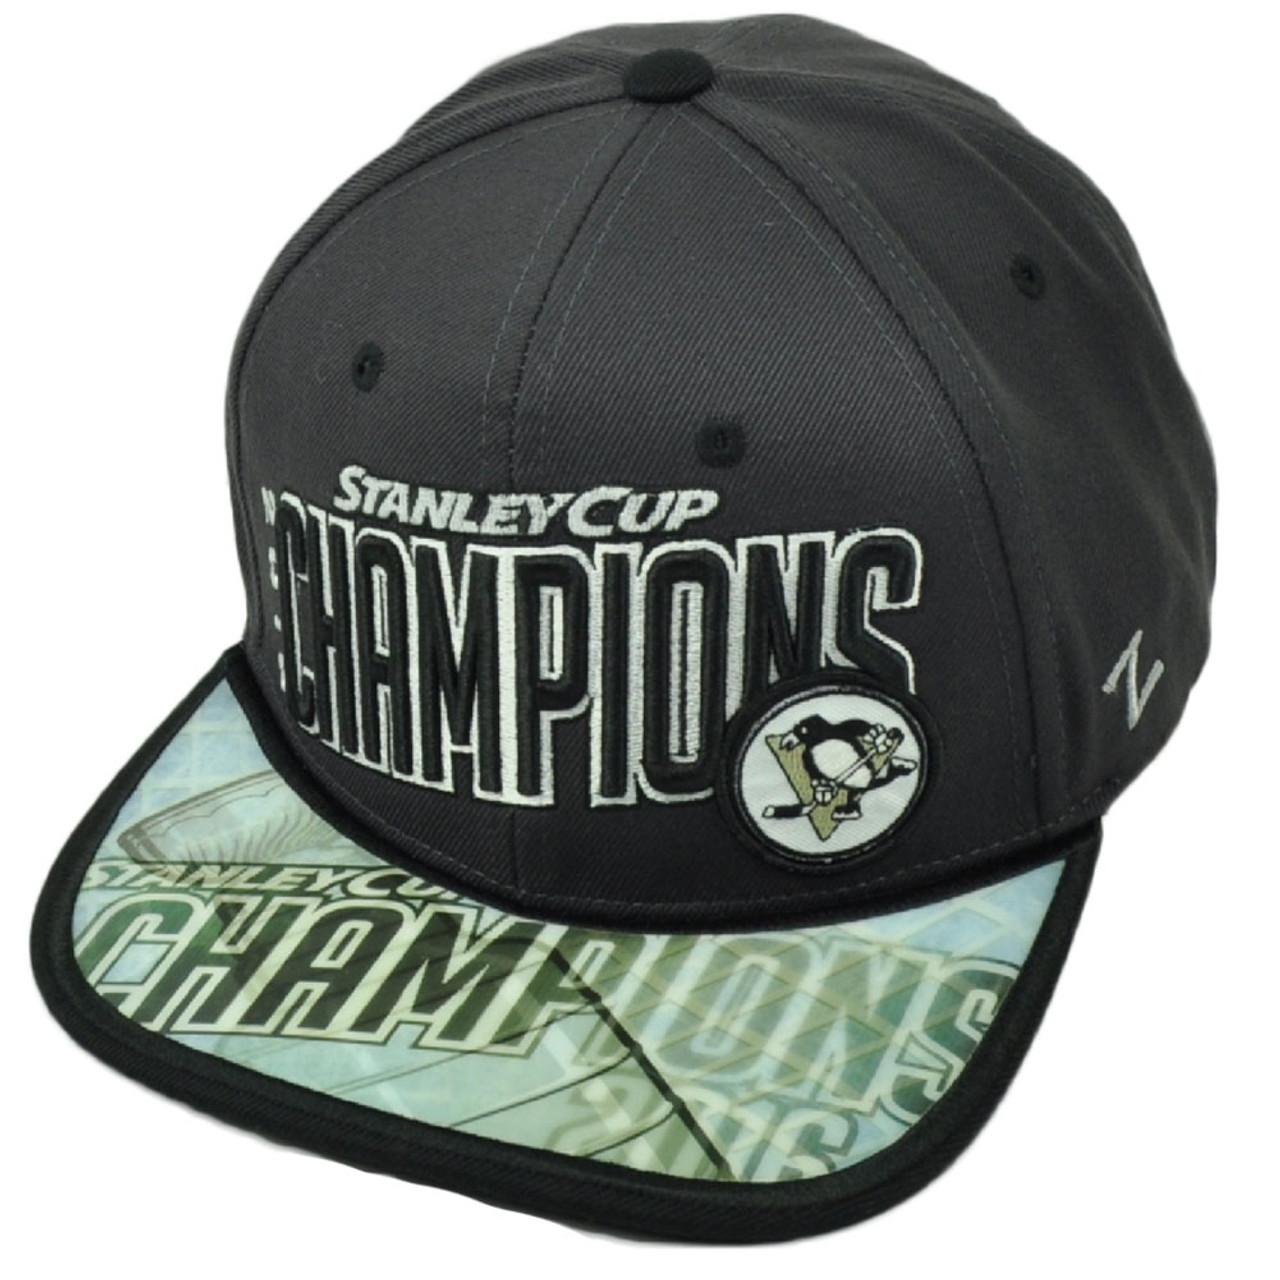 quality design 9d96f b84c6 NHL Zephyr Stanley Cup 2016 Champions Pittsburgh Penguins Snapback Hat Cap  Gray - Cap Store Online.com